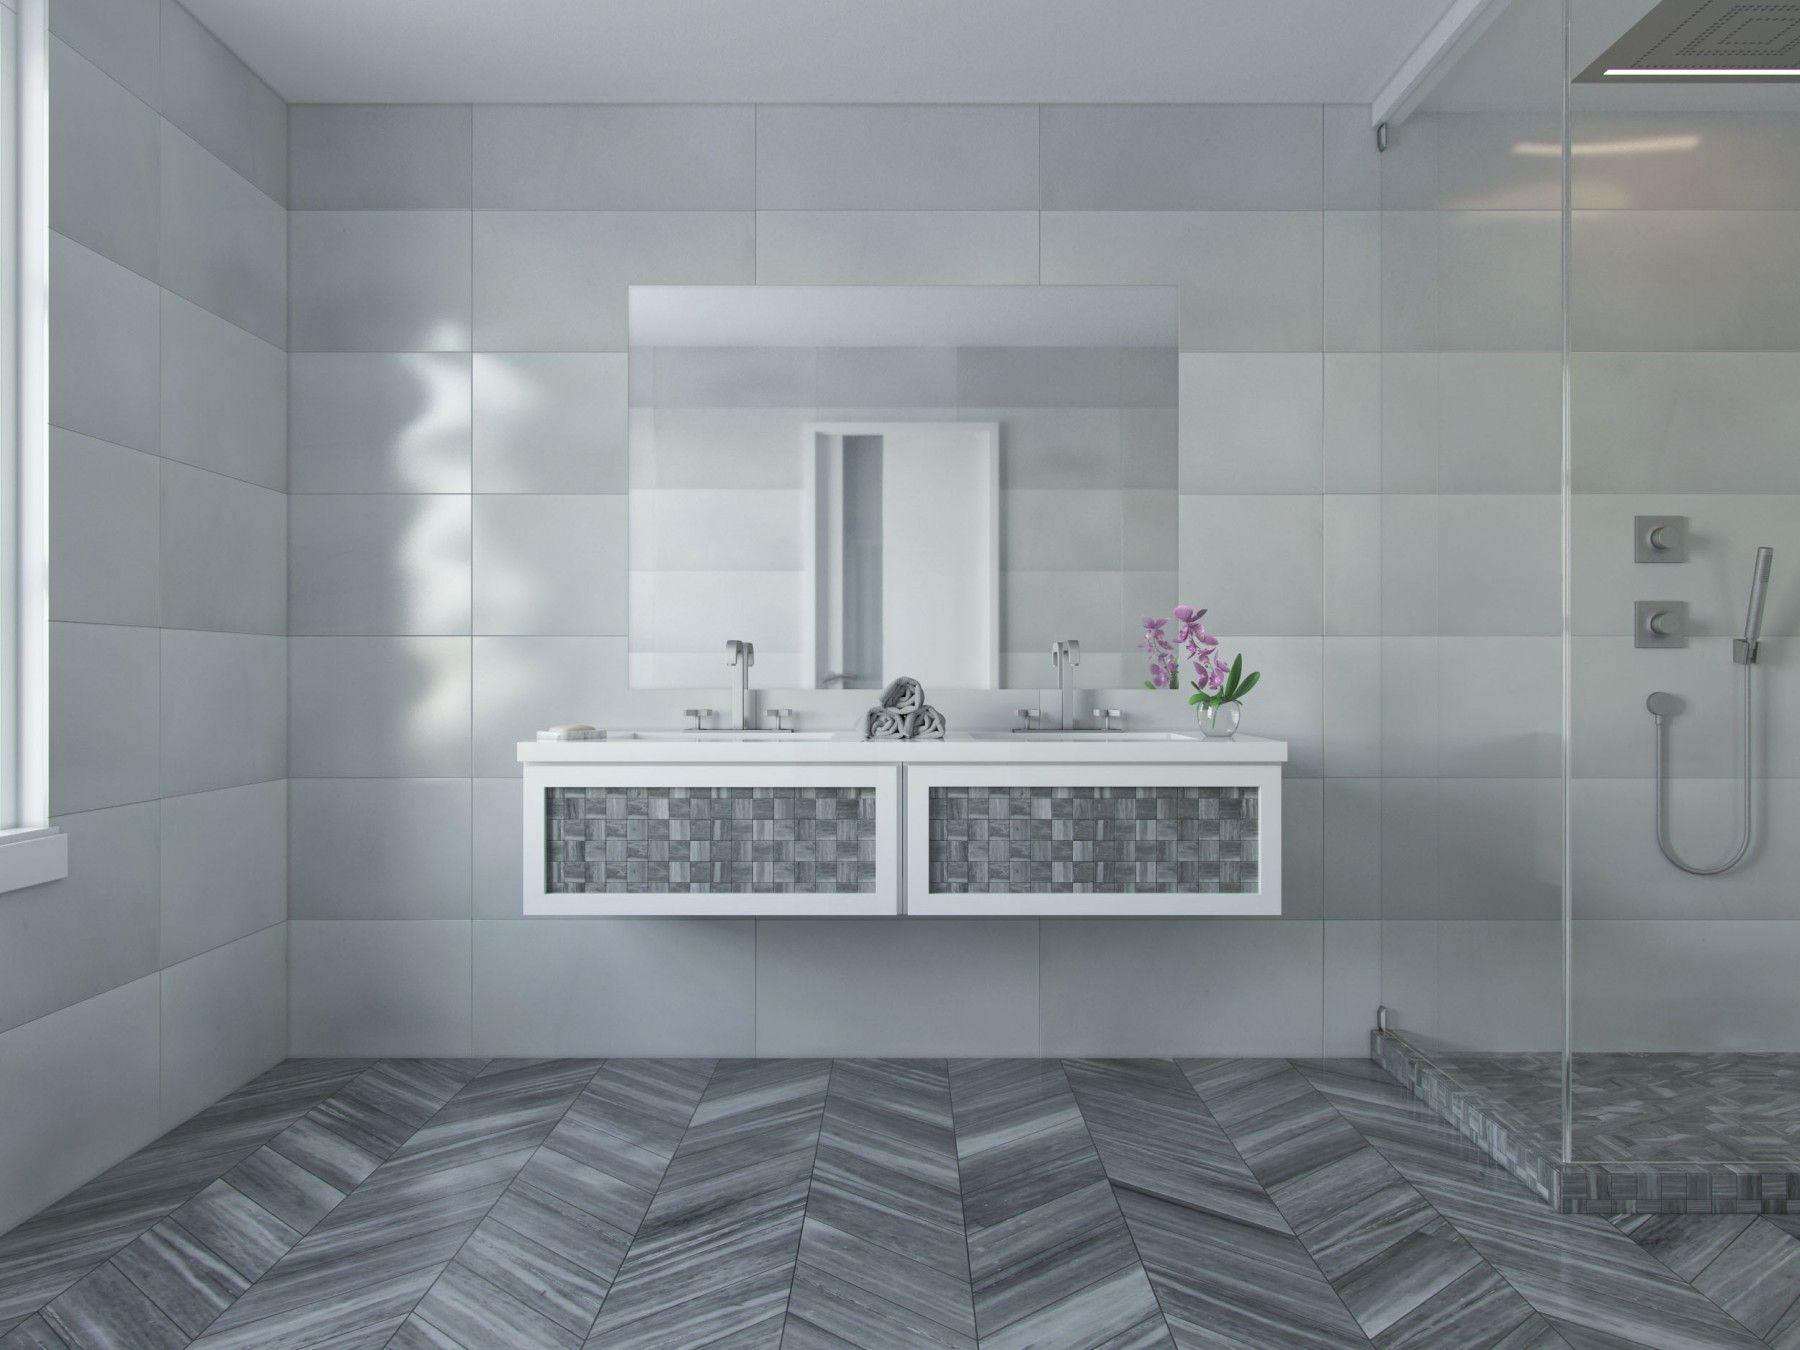 Milan Gray Chevron Marble Tile #gray #tile #marble #chevron Pleasing Flooring For Bathrooms Inspiration Design